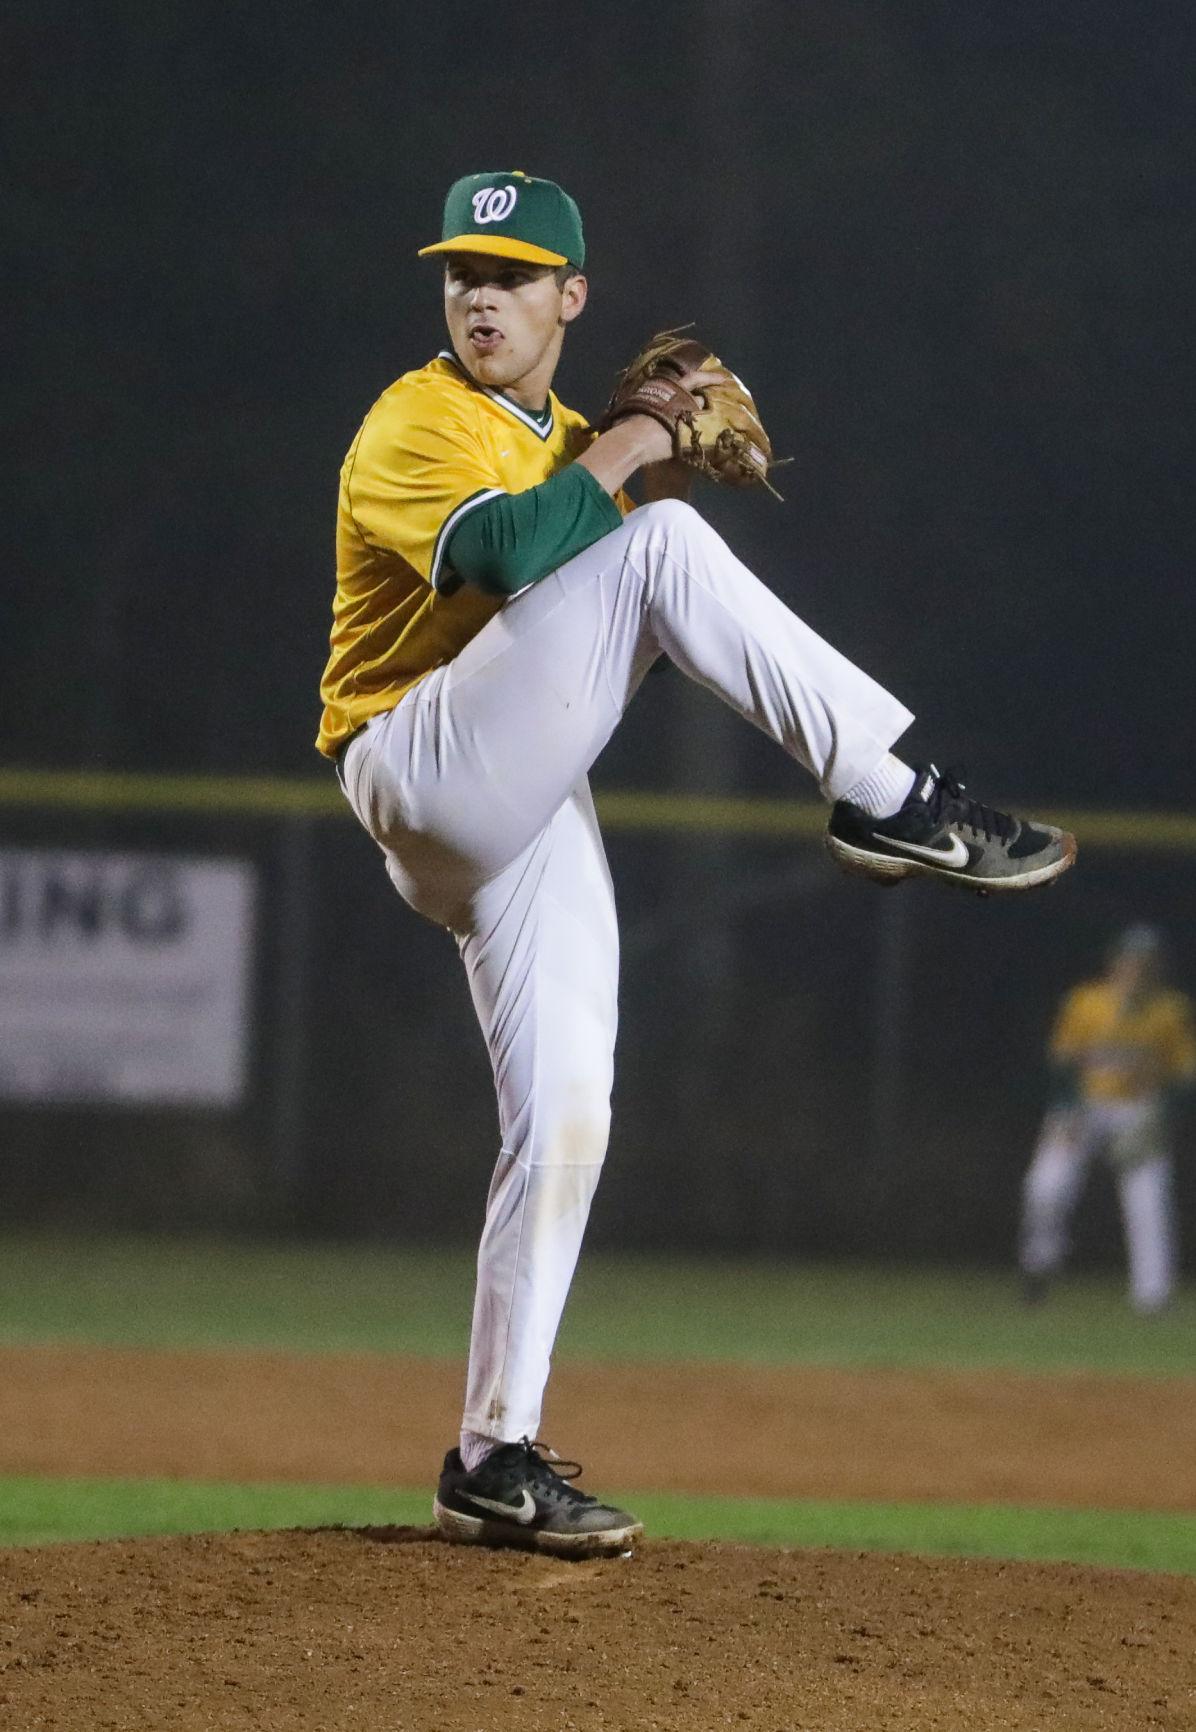 Albany at Walker baseball Christian Cassels